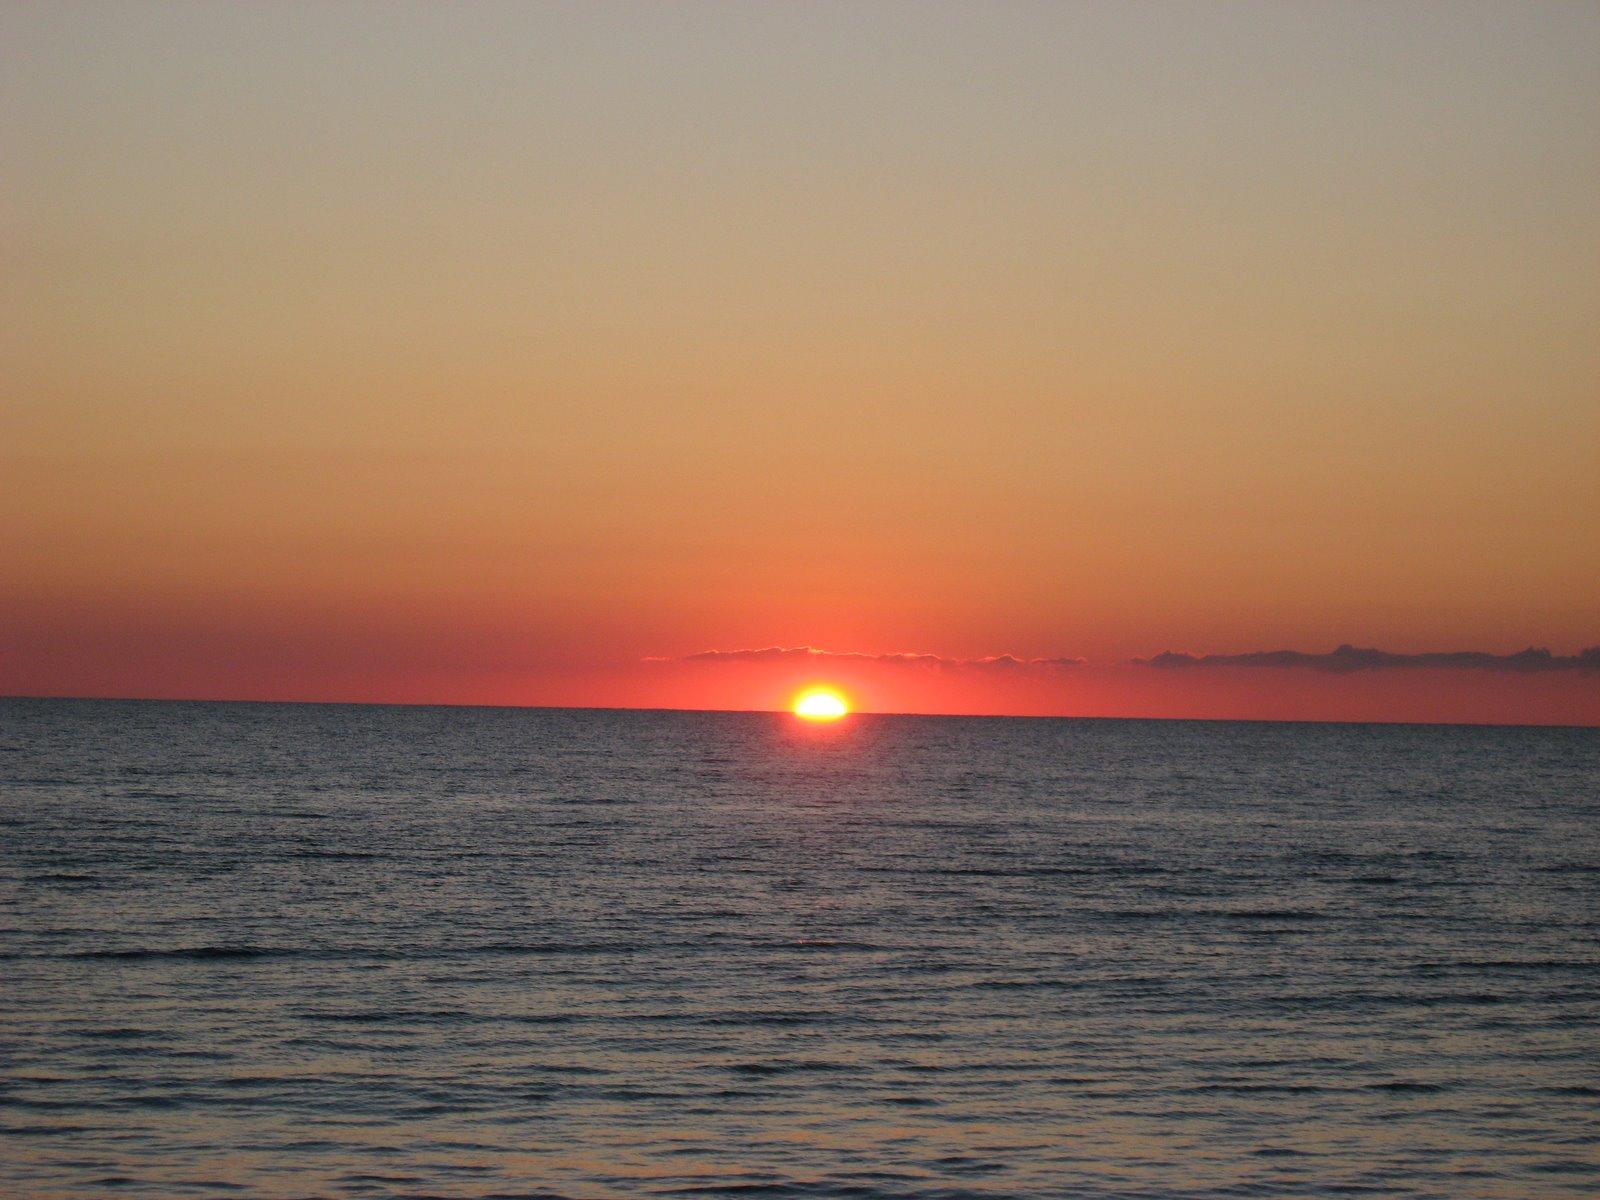 [Bethany+Beach+08+096.jpg]